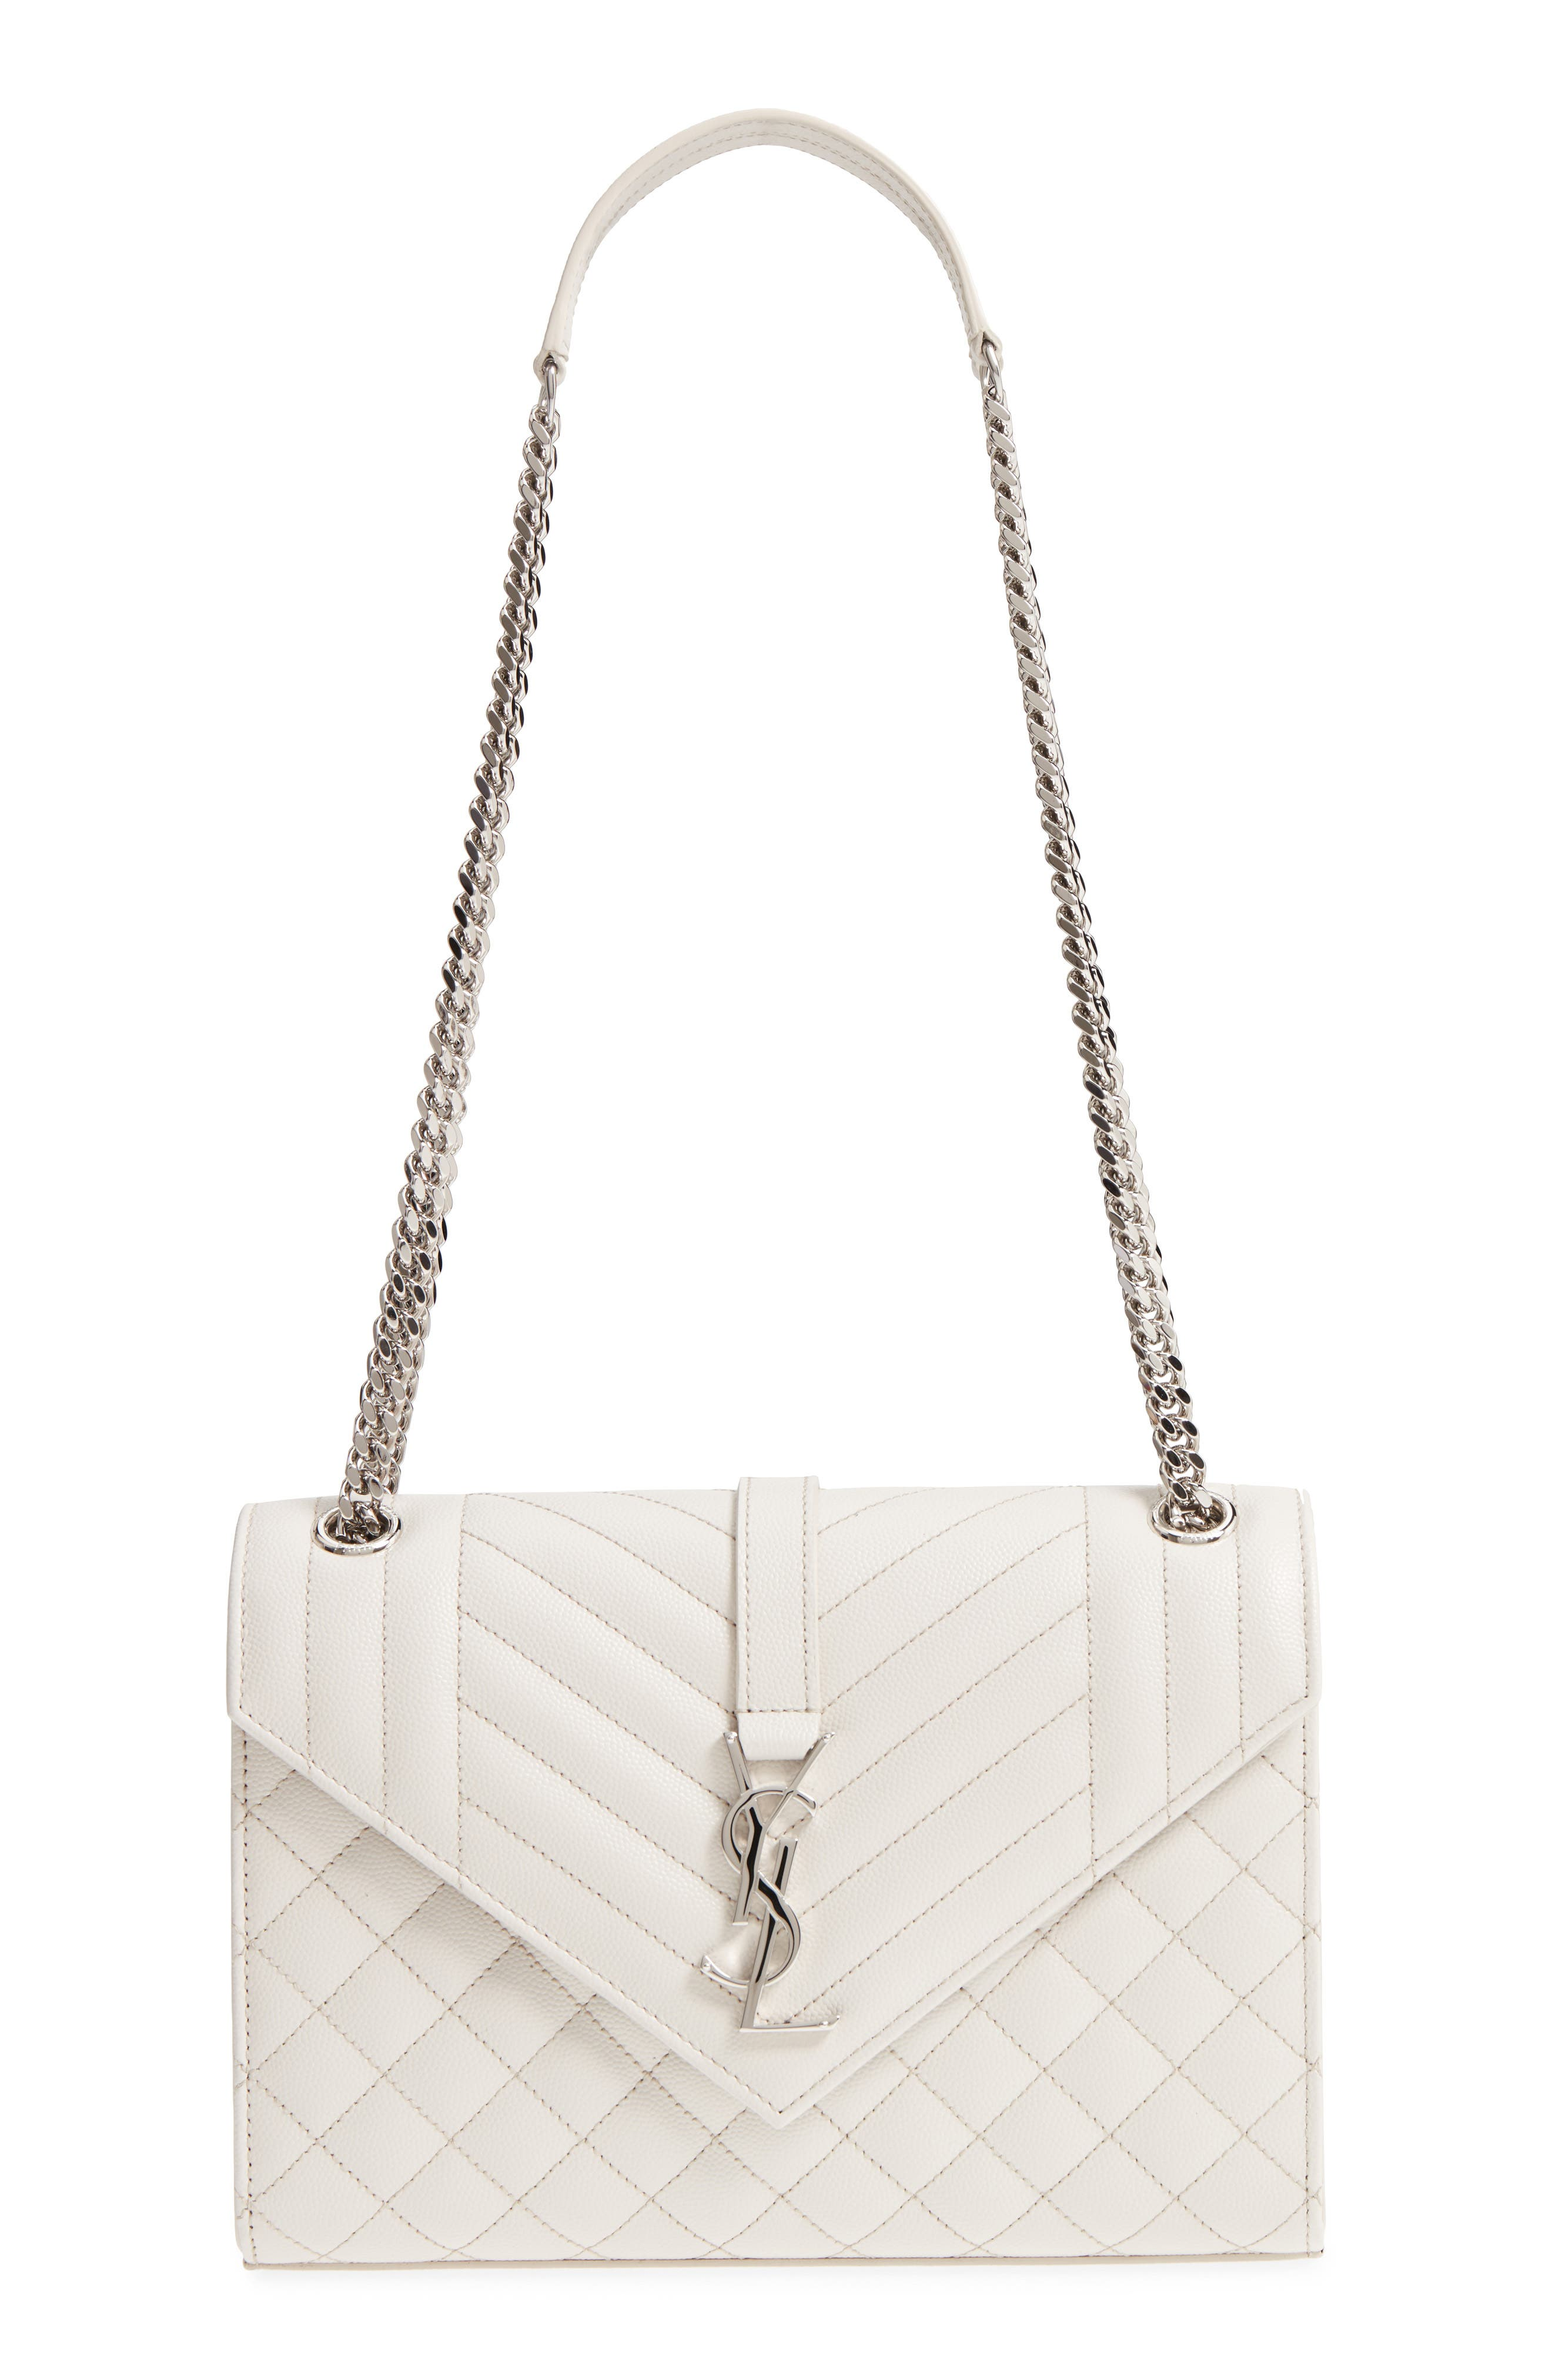 Medium Cassandra Calfskin Shoulder Bag,                             Main thumbnail 1, color,                             ICY WHITE/ ICY WHITE